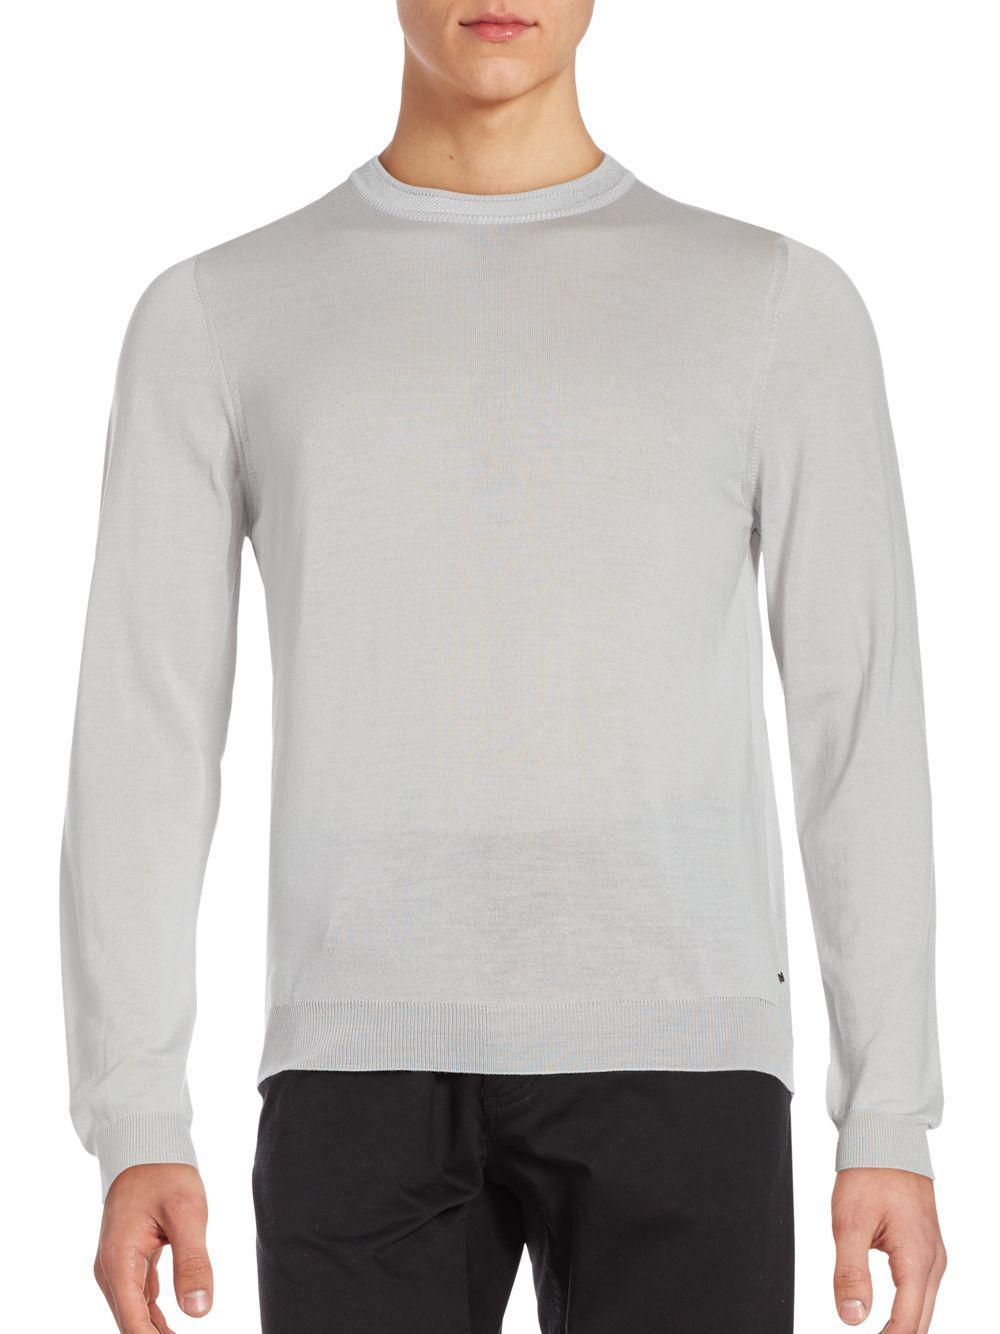 Lyst - Porsche Design Merino Wool Crewneck Sweater in Gray for Men 58a77d276